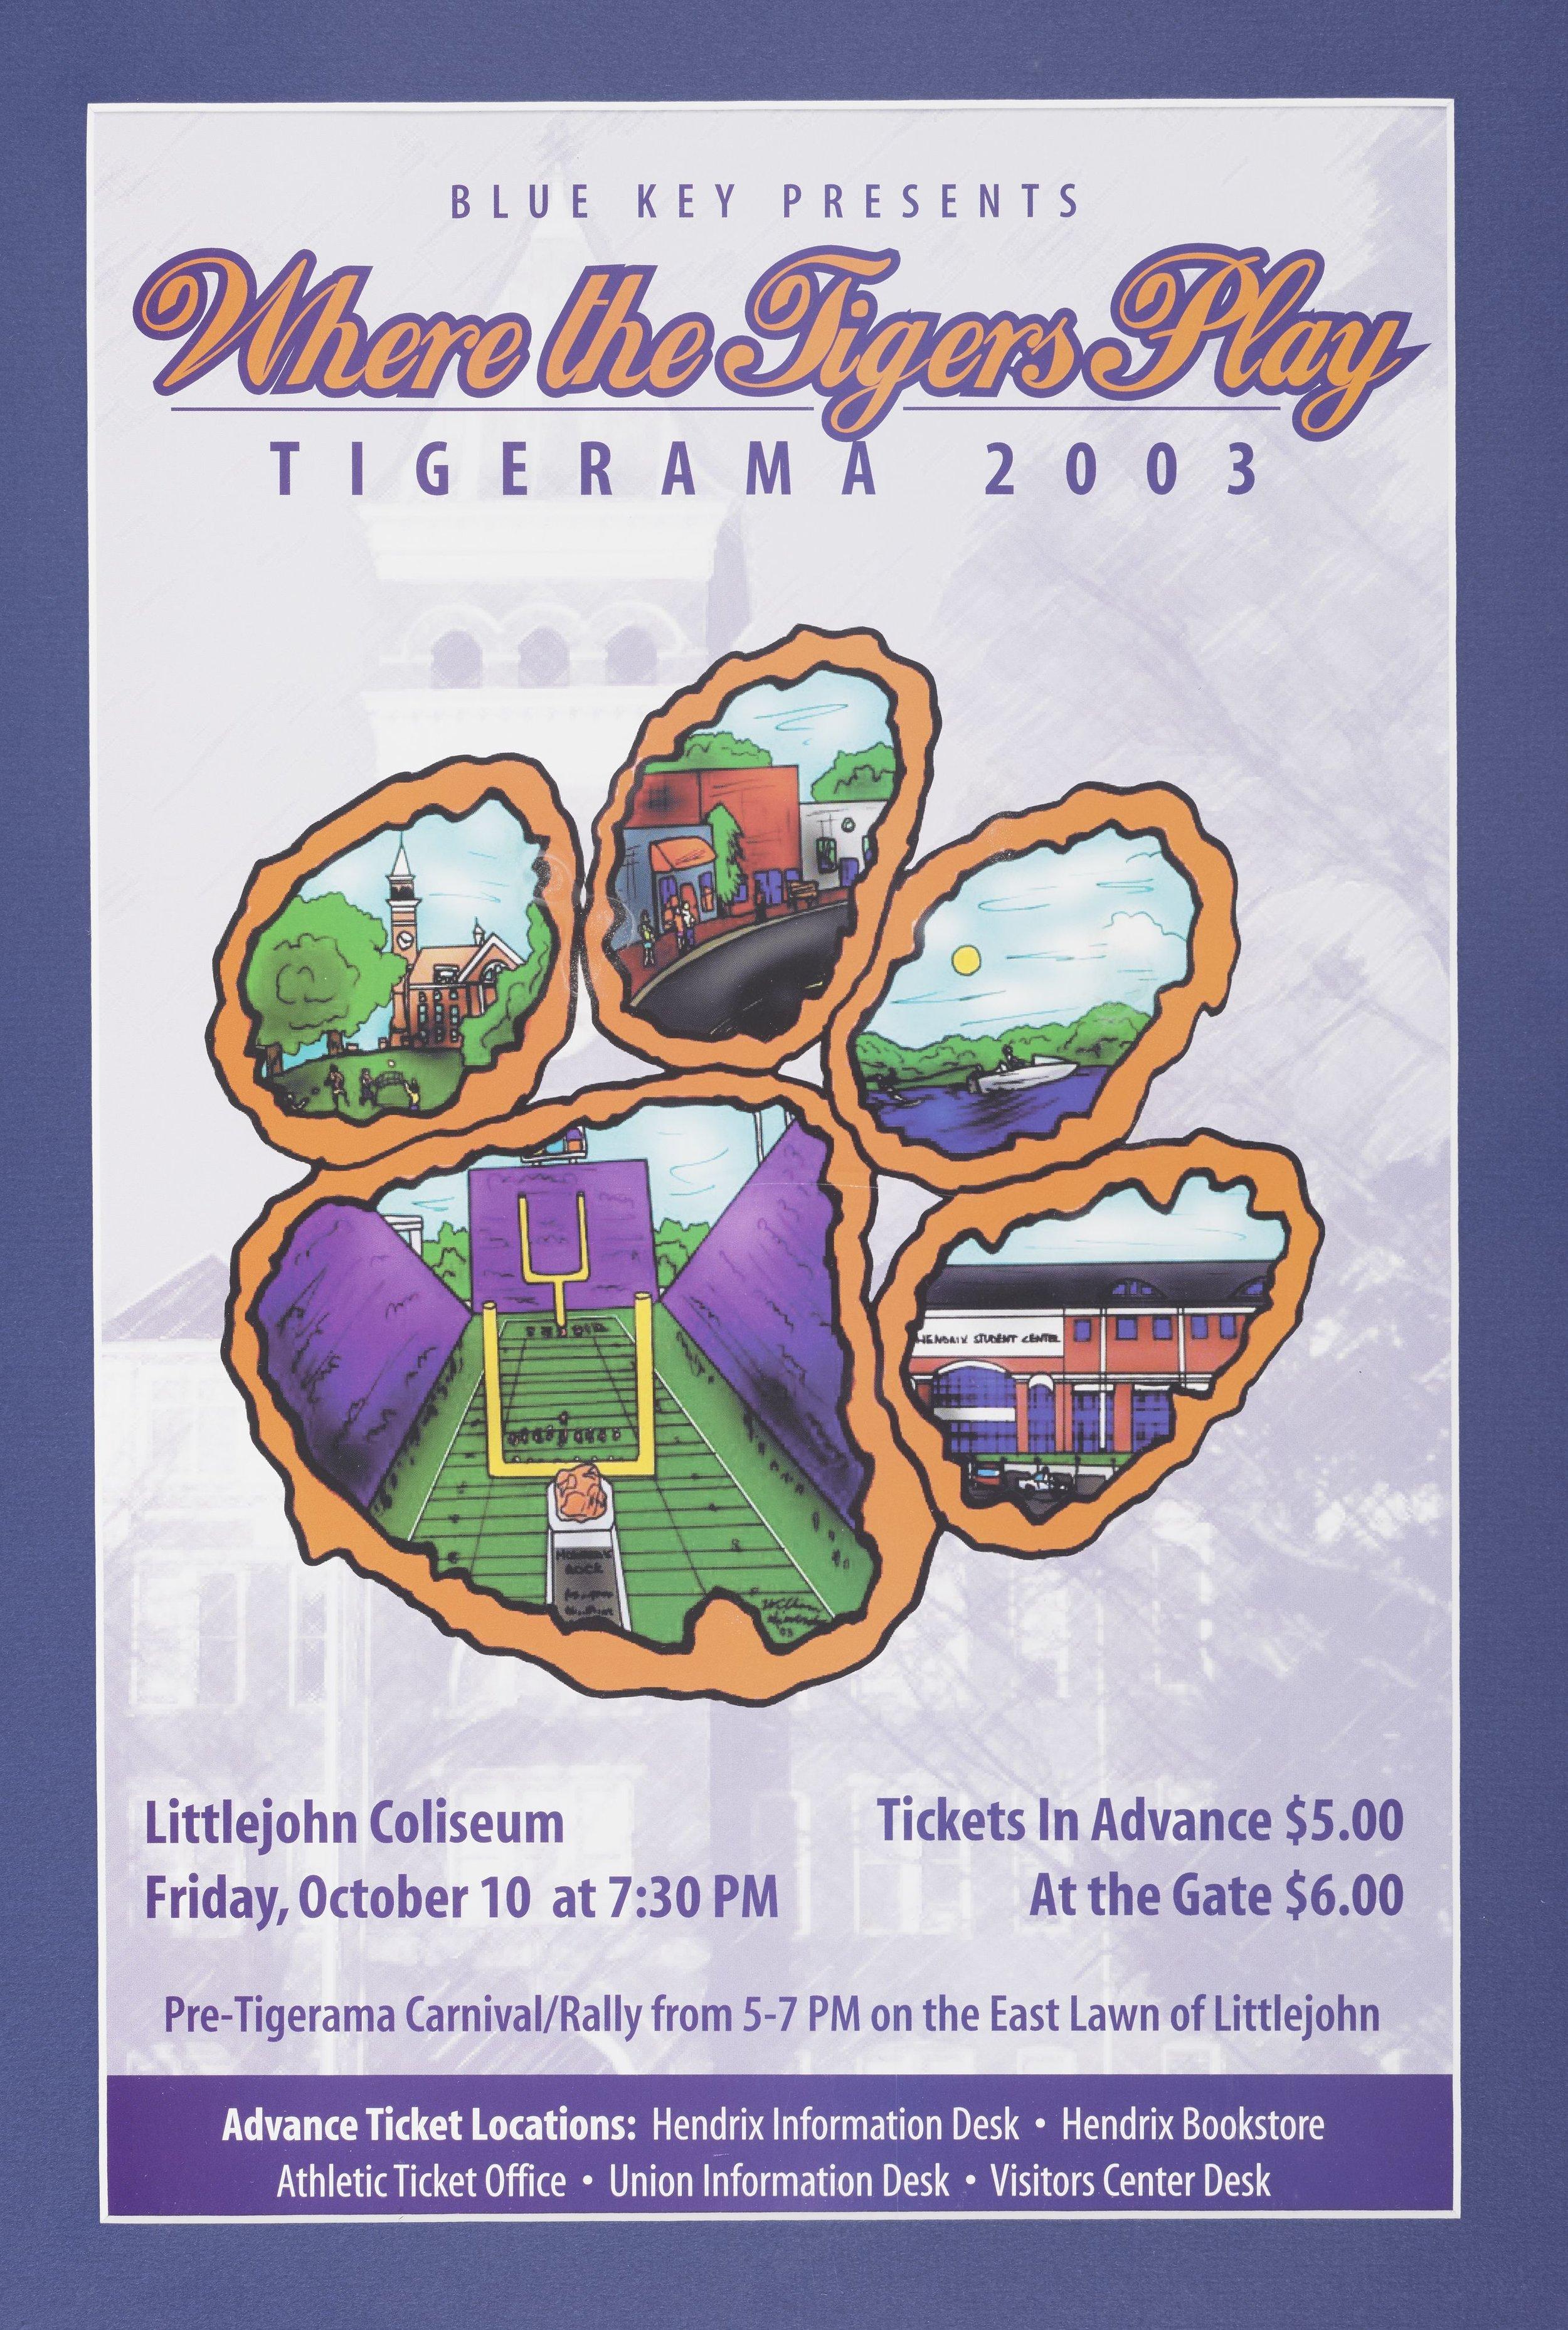 Tigerama 2003